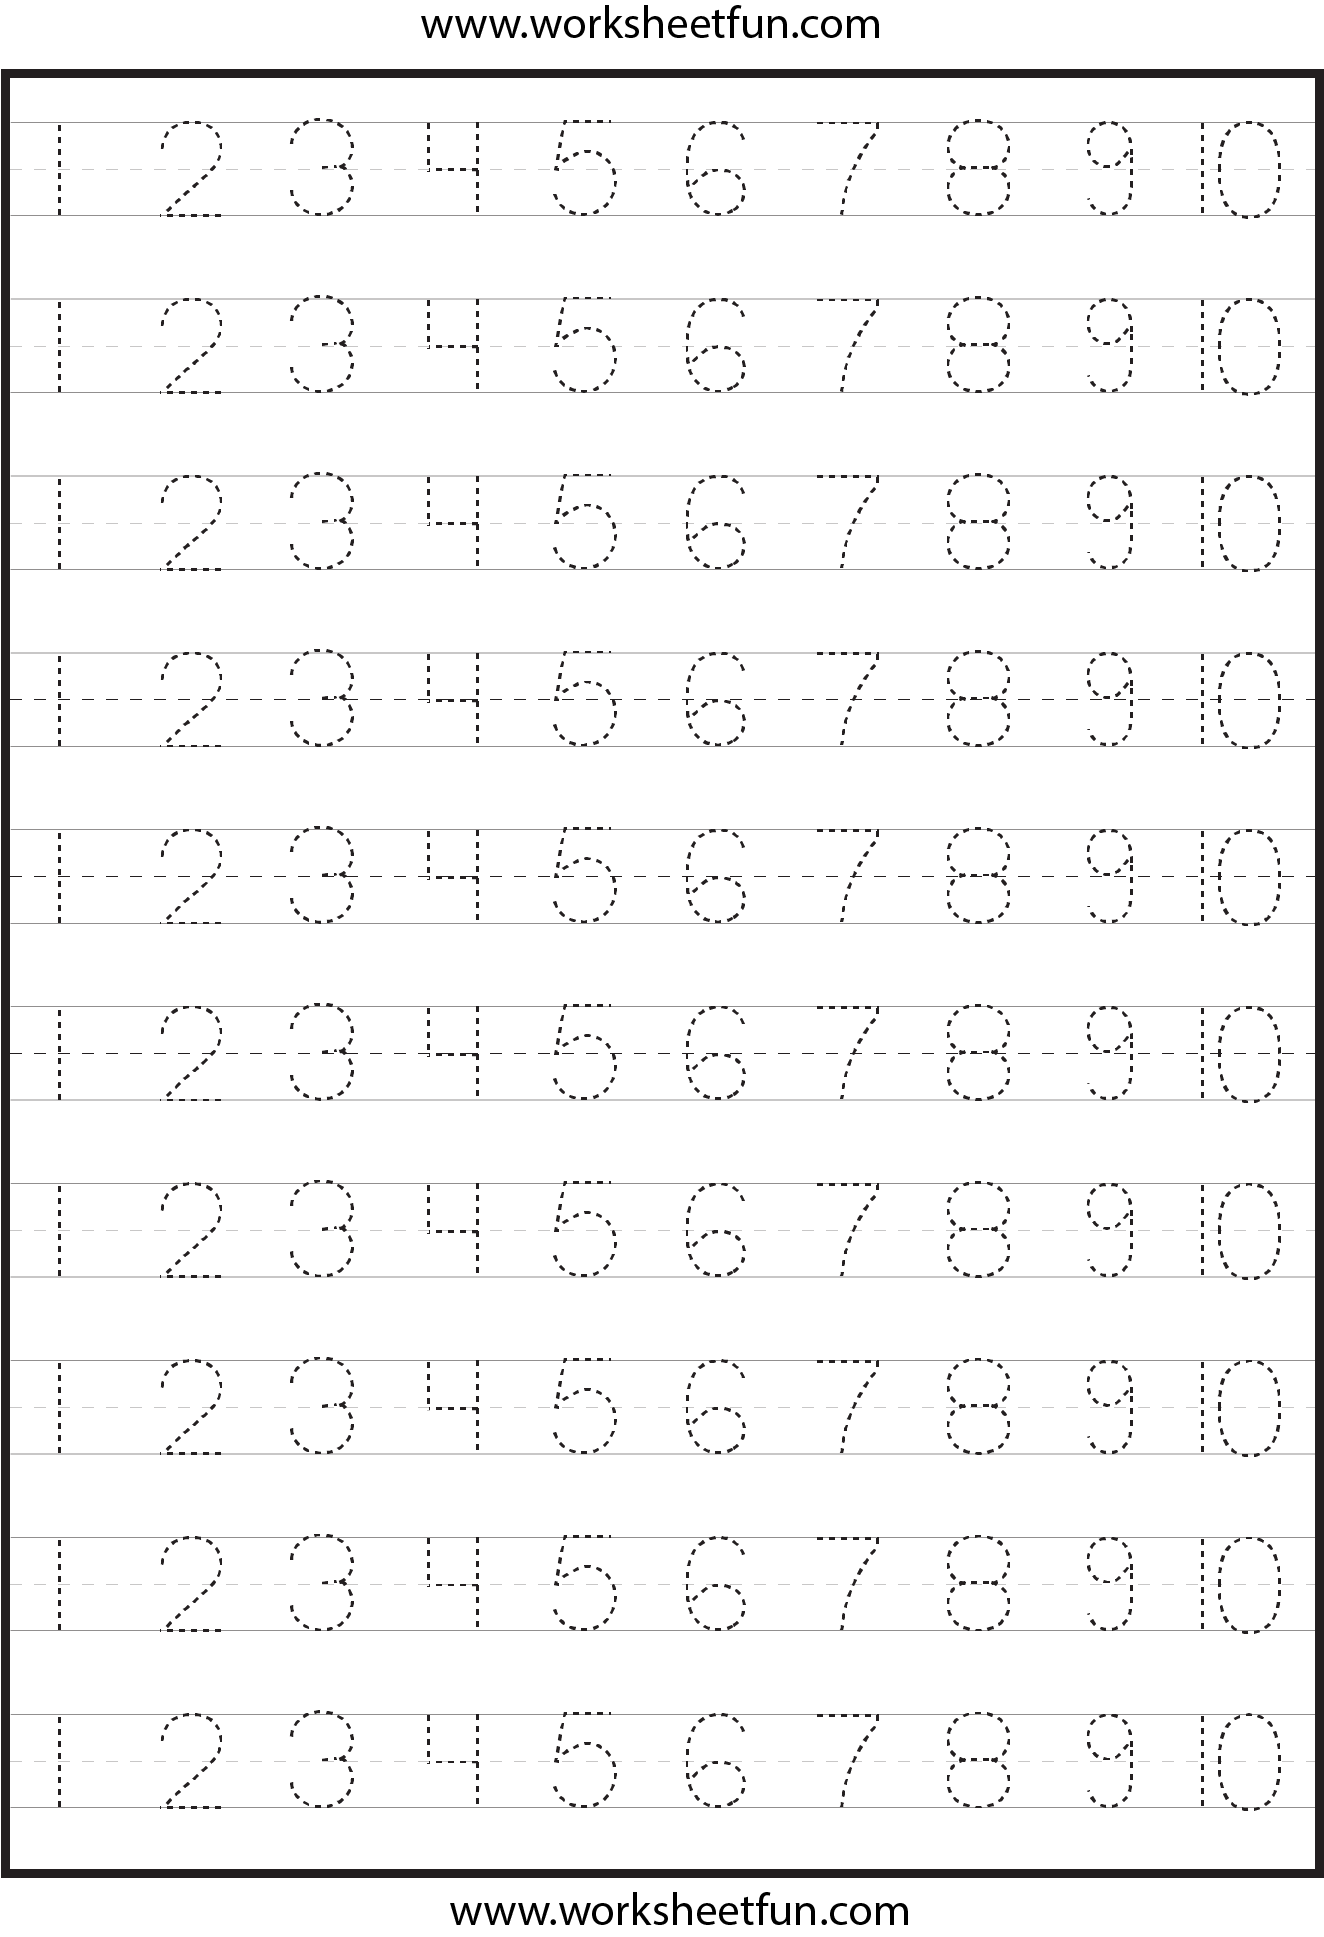 Free Number Tracing Worksheets 1 10 - humorholics